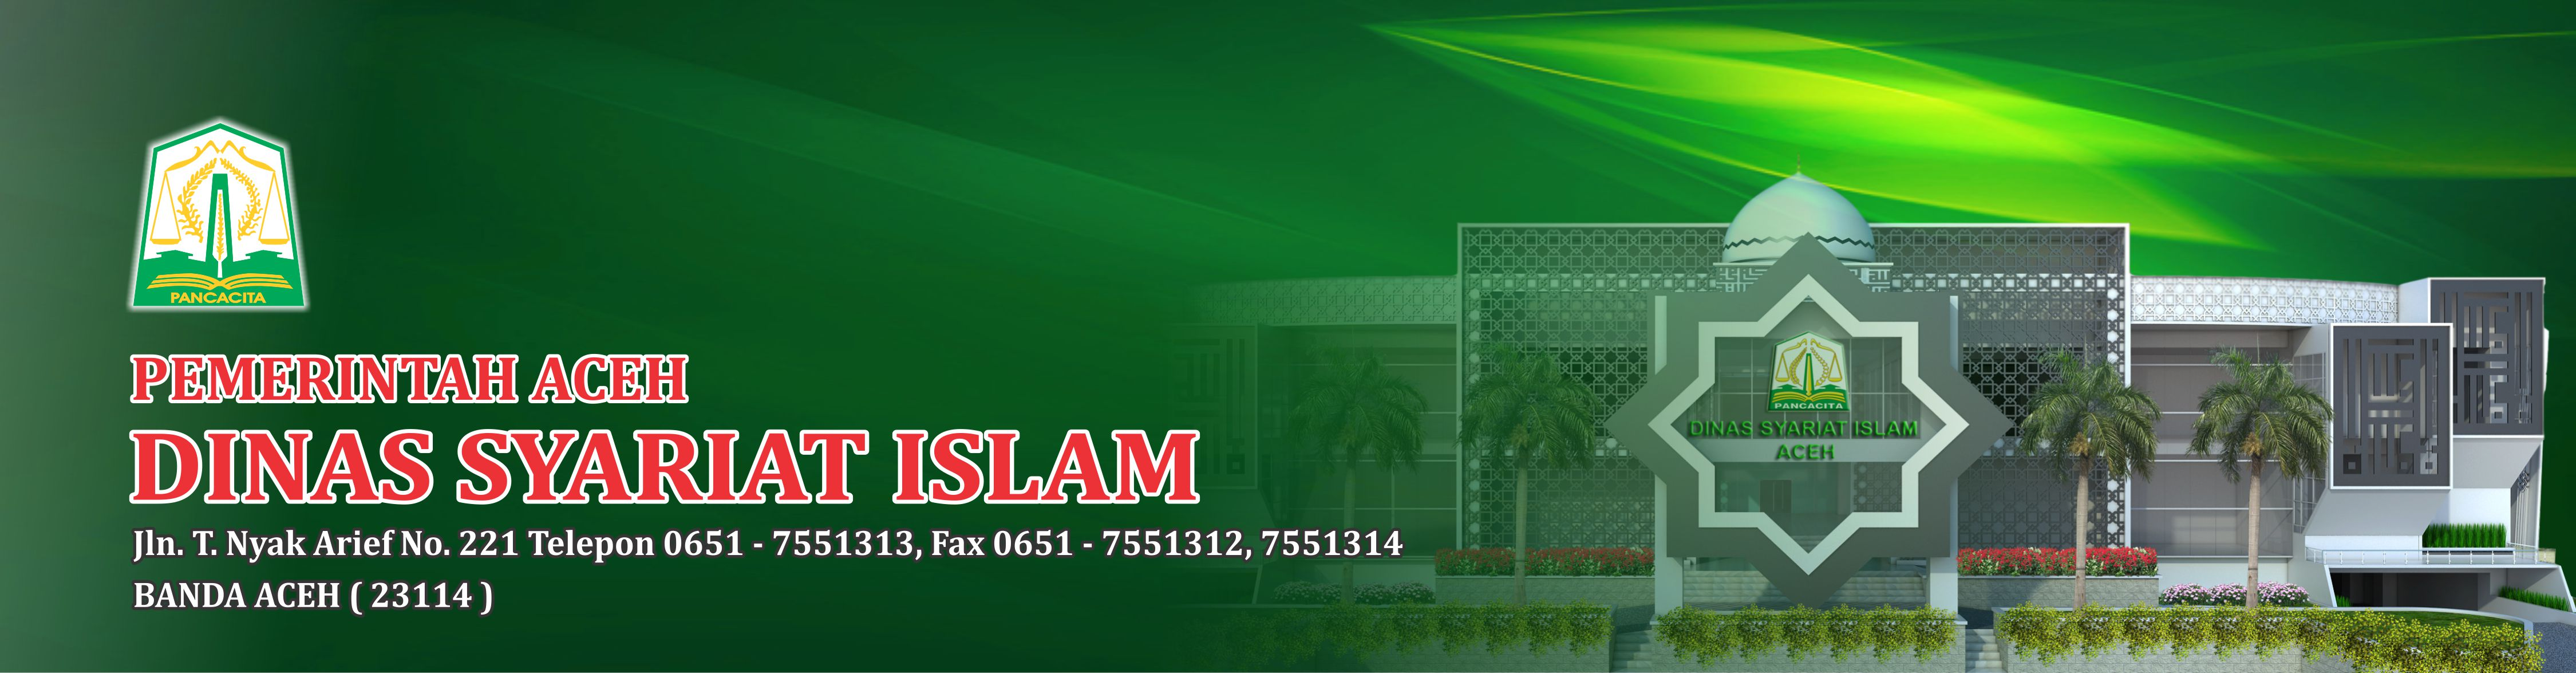 Dinas Syariat Islam Aceh Logo